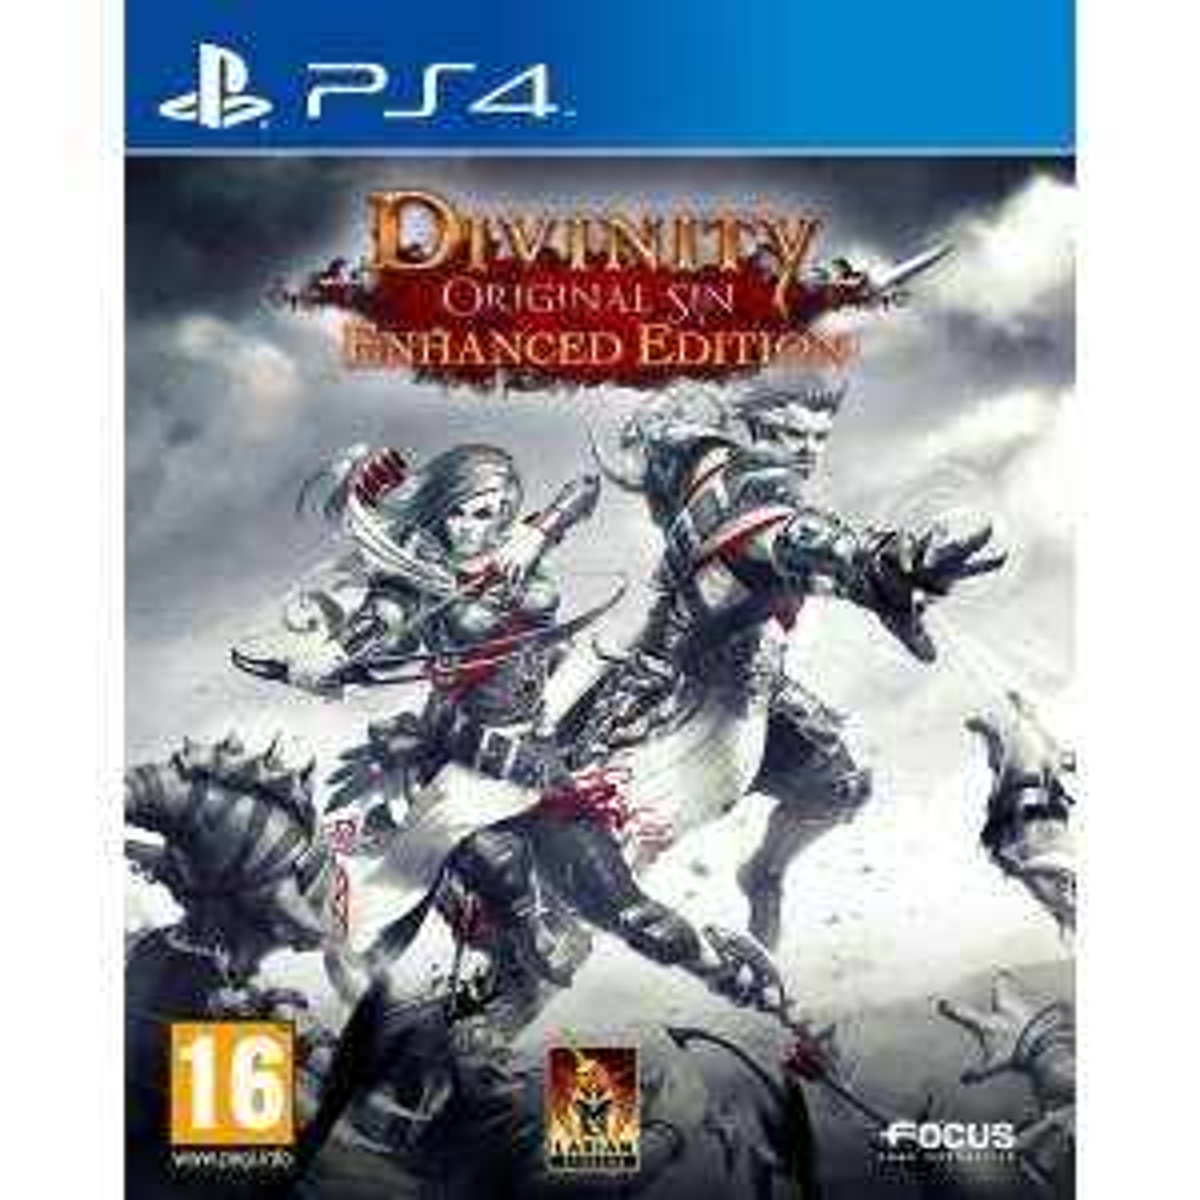 Divinity Original Sin : Enhanced Edition sur PS4 et Xbox One